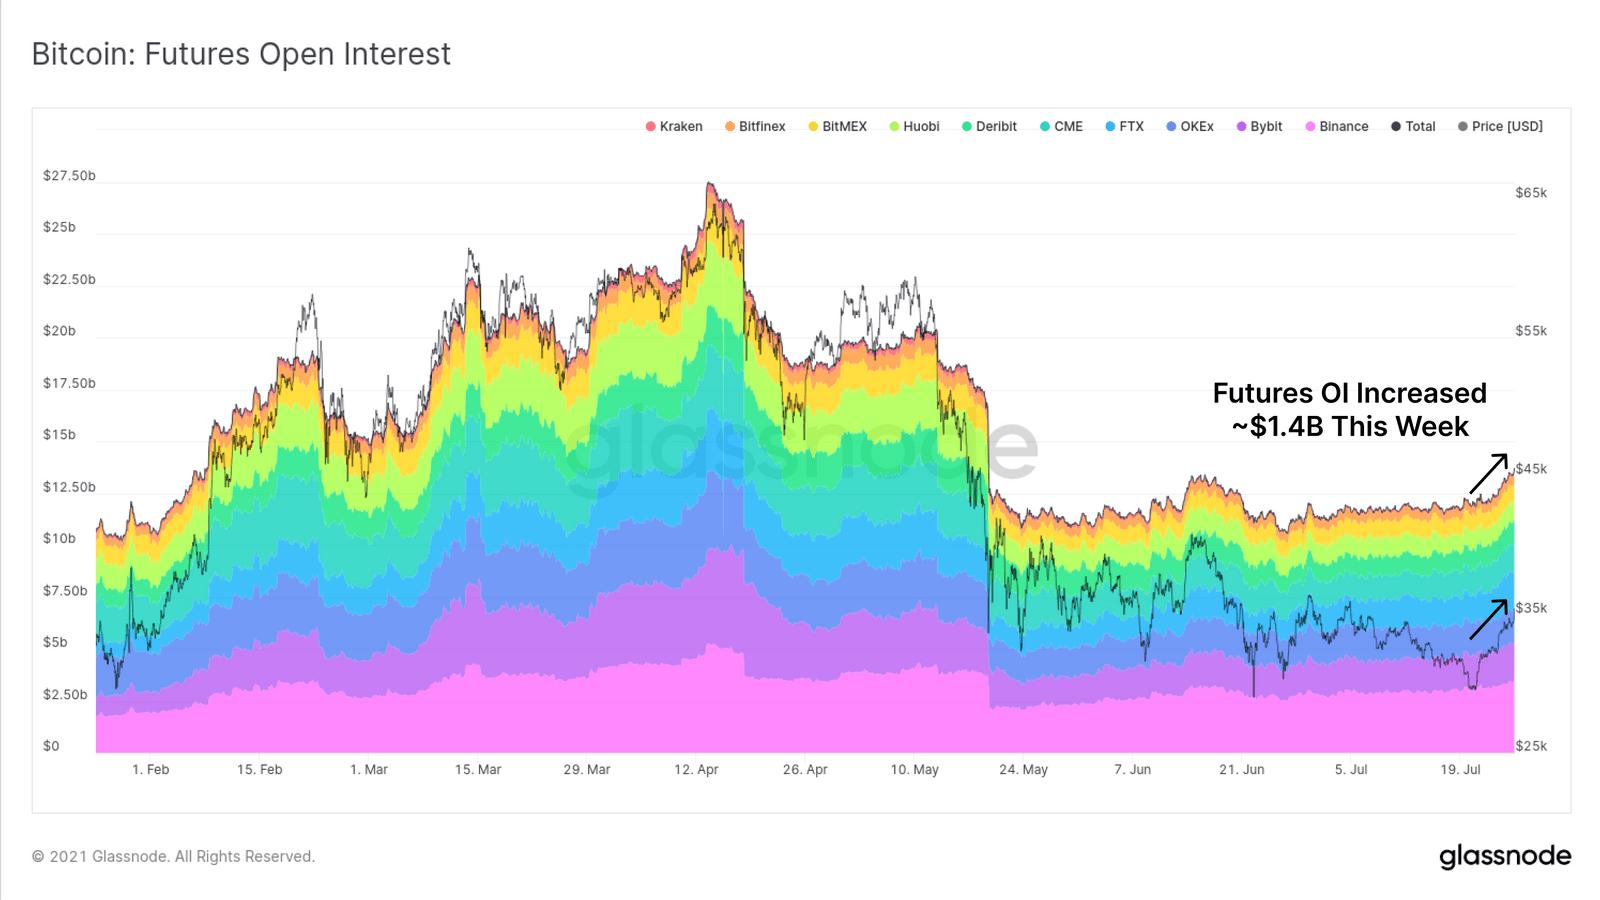 Open Interest in den Bitcoin Futures